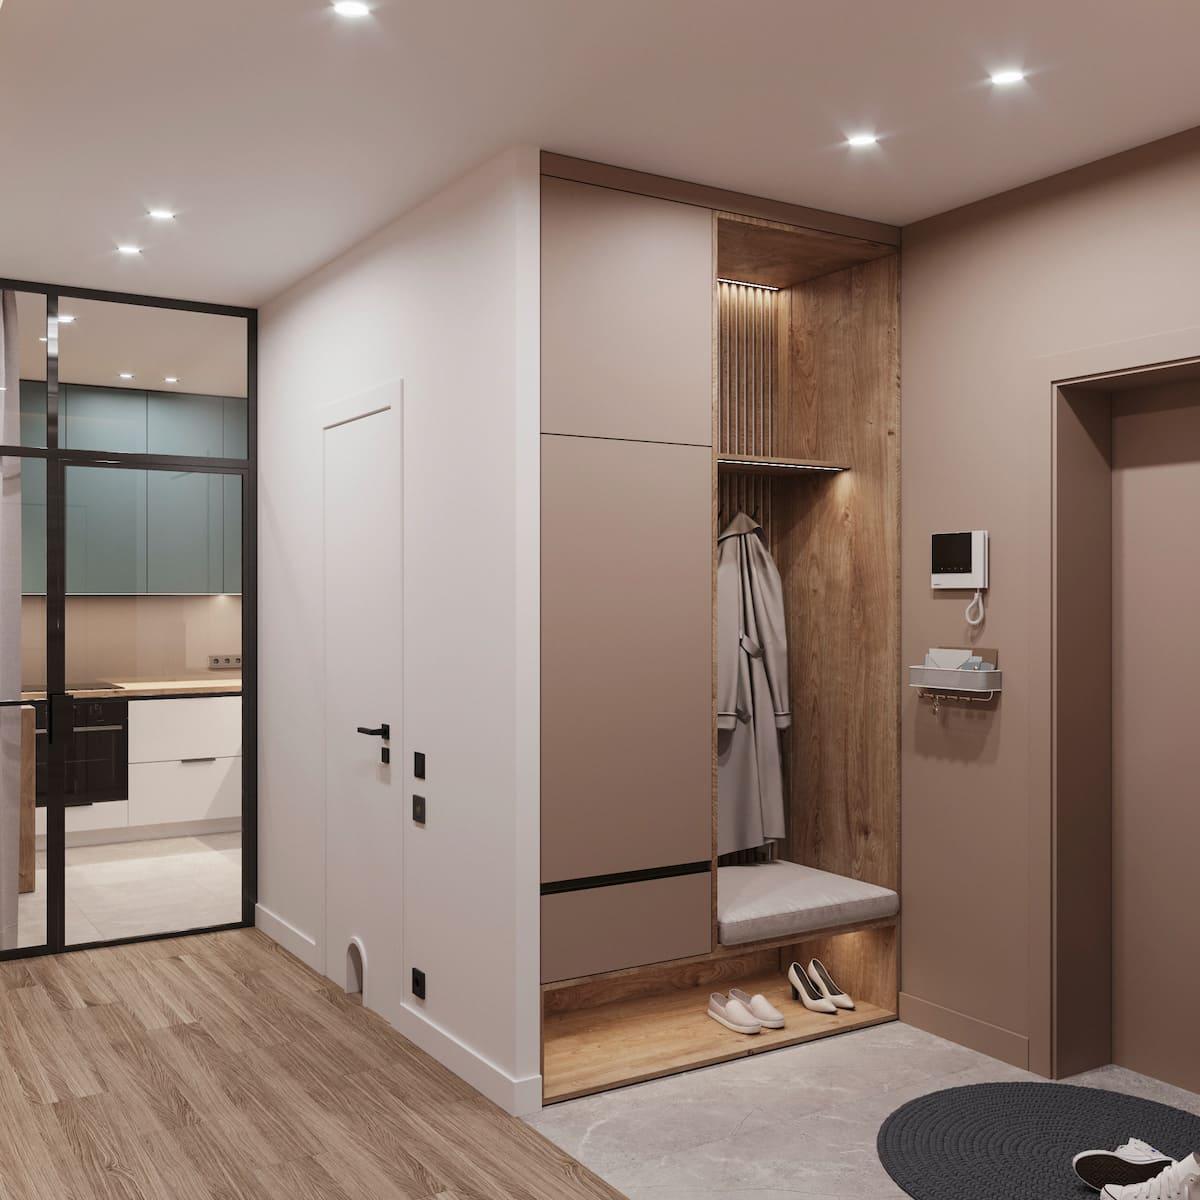 модный дизайн интерьера квартиры фото 97